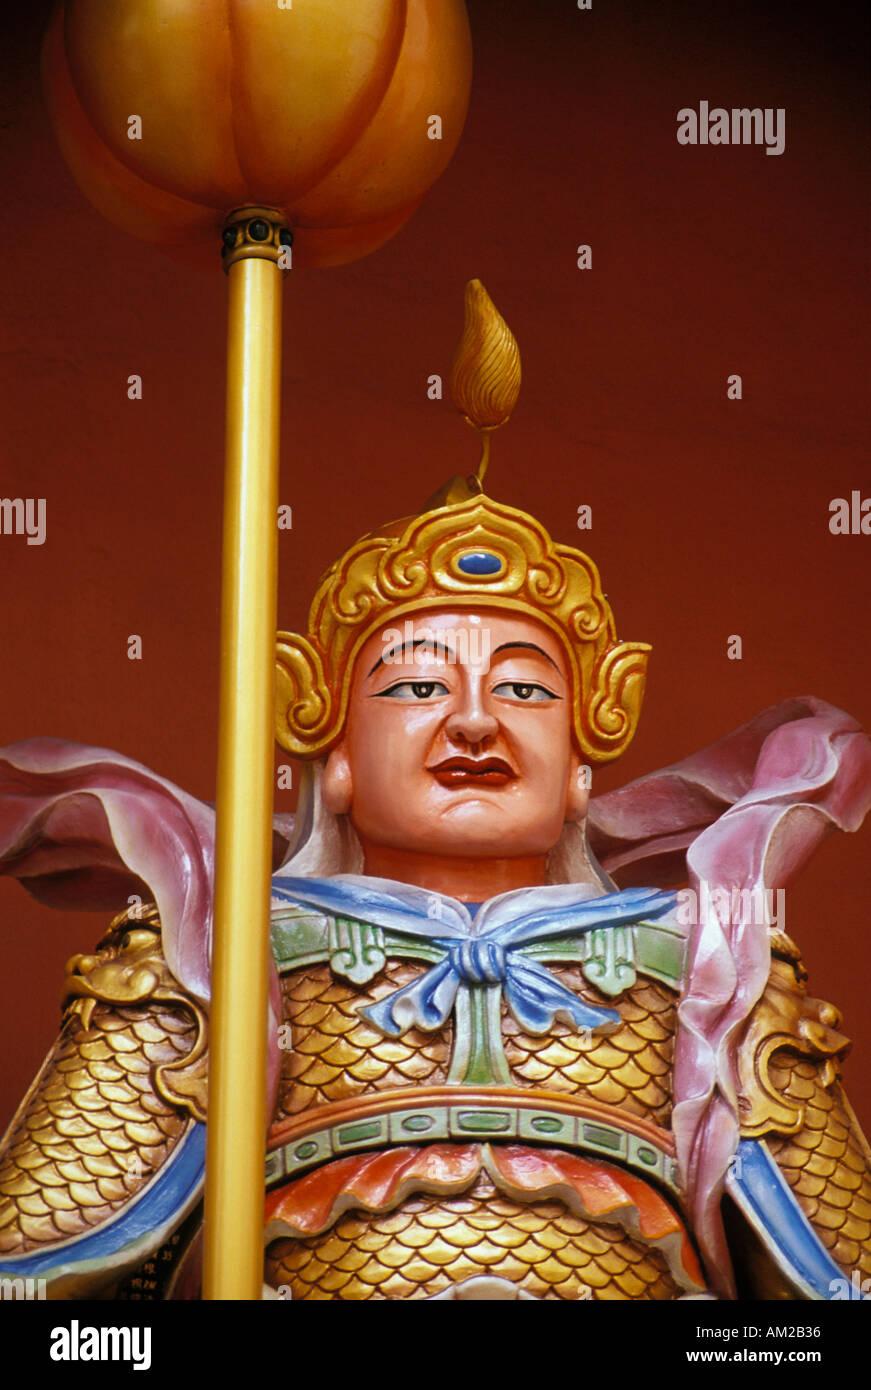 Guardian statues at the Chinese Temple Kota Kinabalu Sabah Malaysia - Stock Image